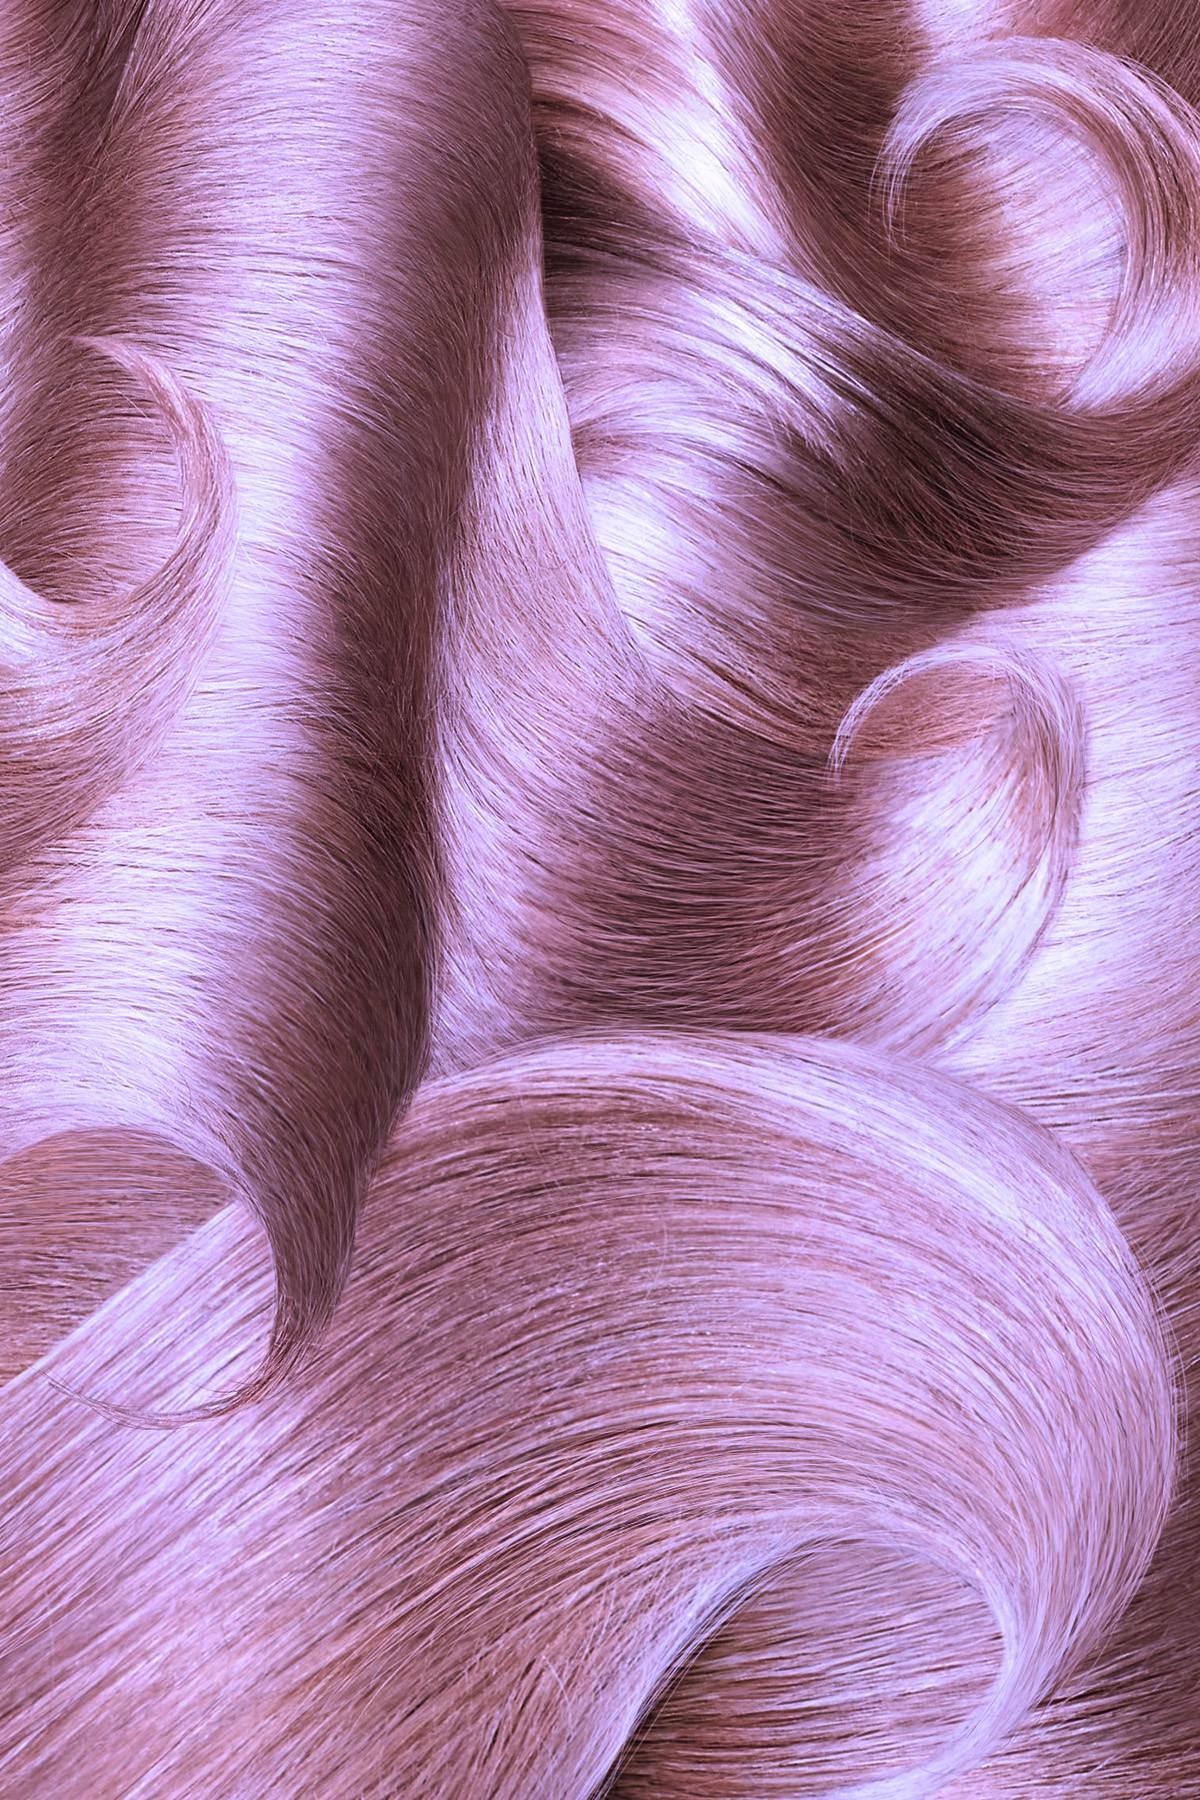 PLATINUM PINK - hair sample